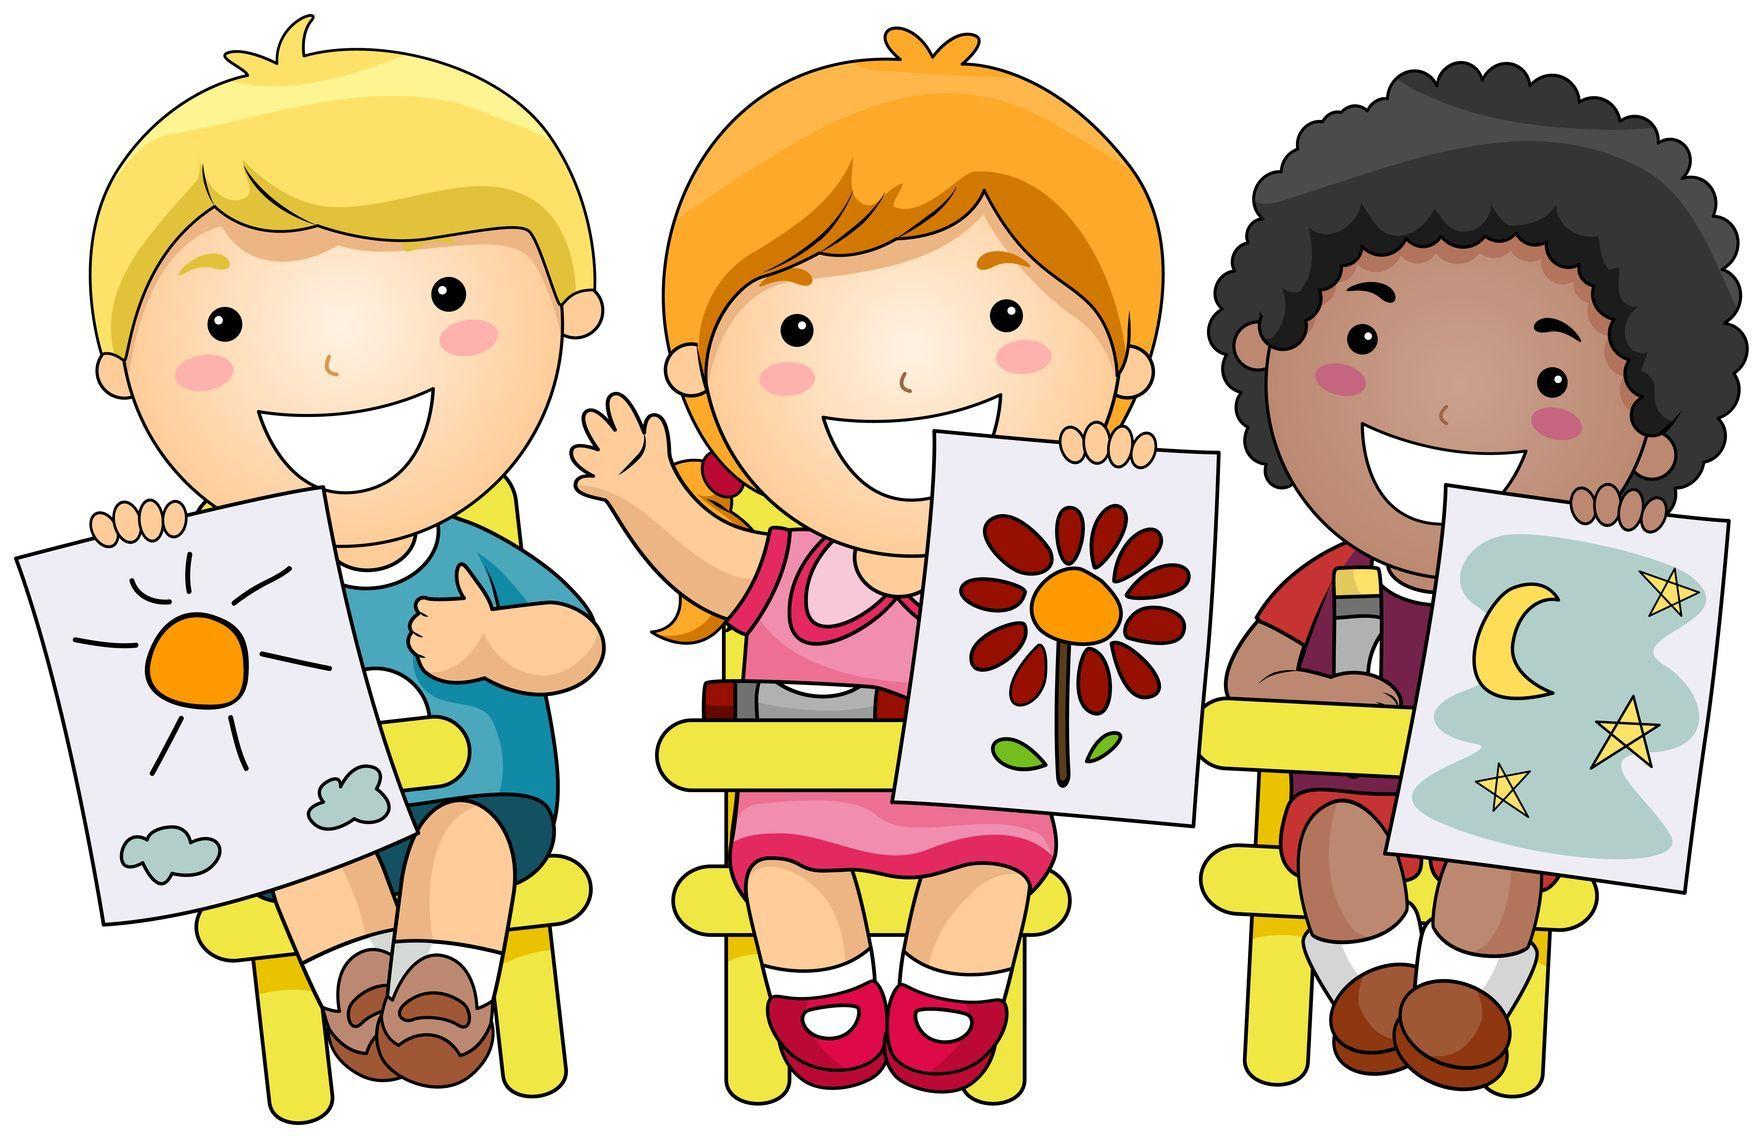 Preschool children clipart 6 » Clipart Portal.